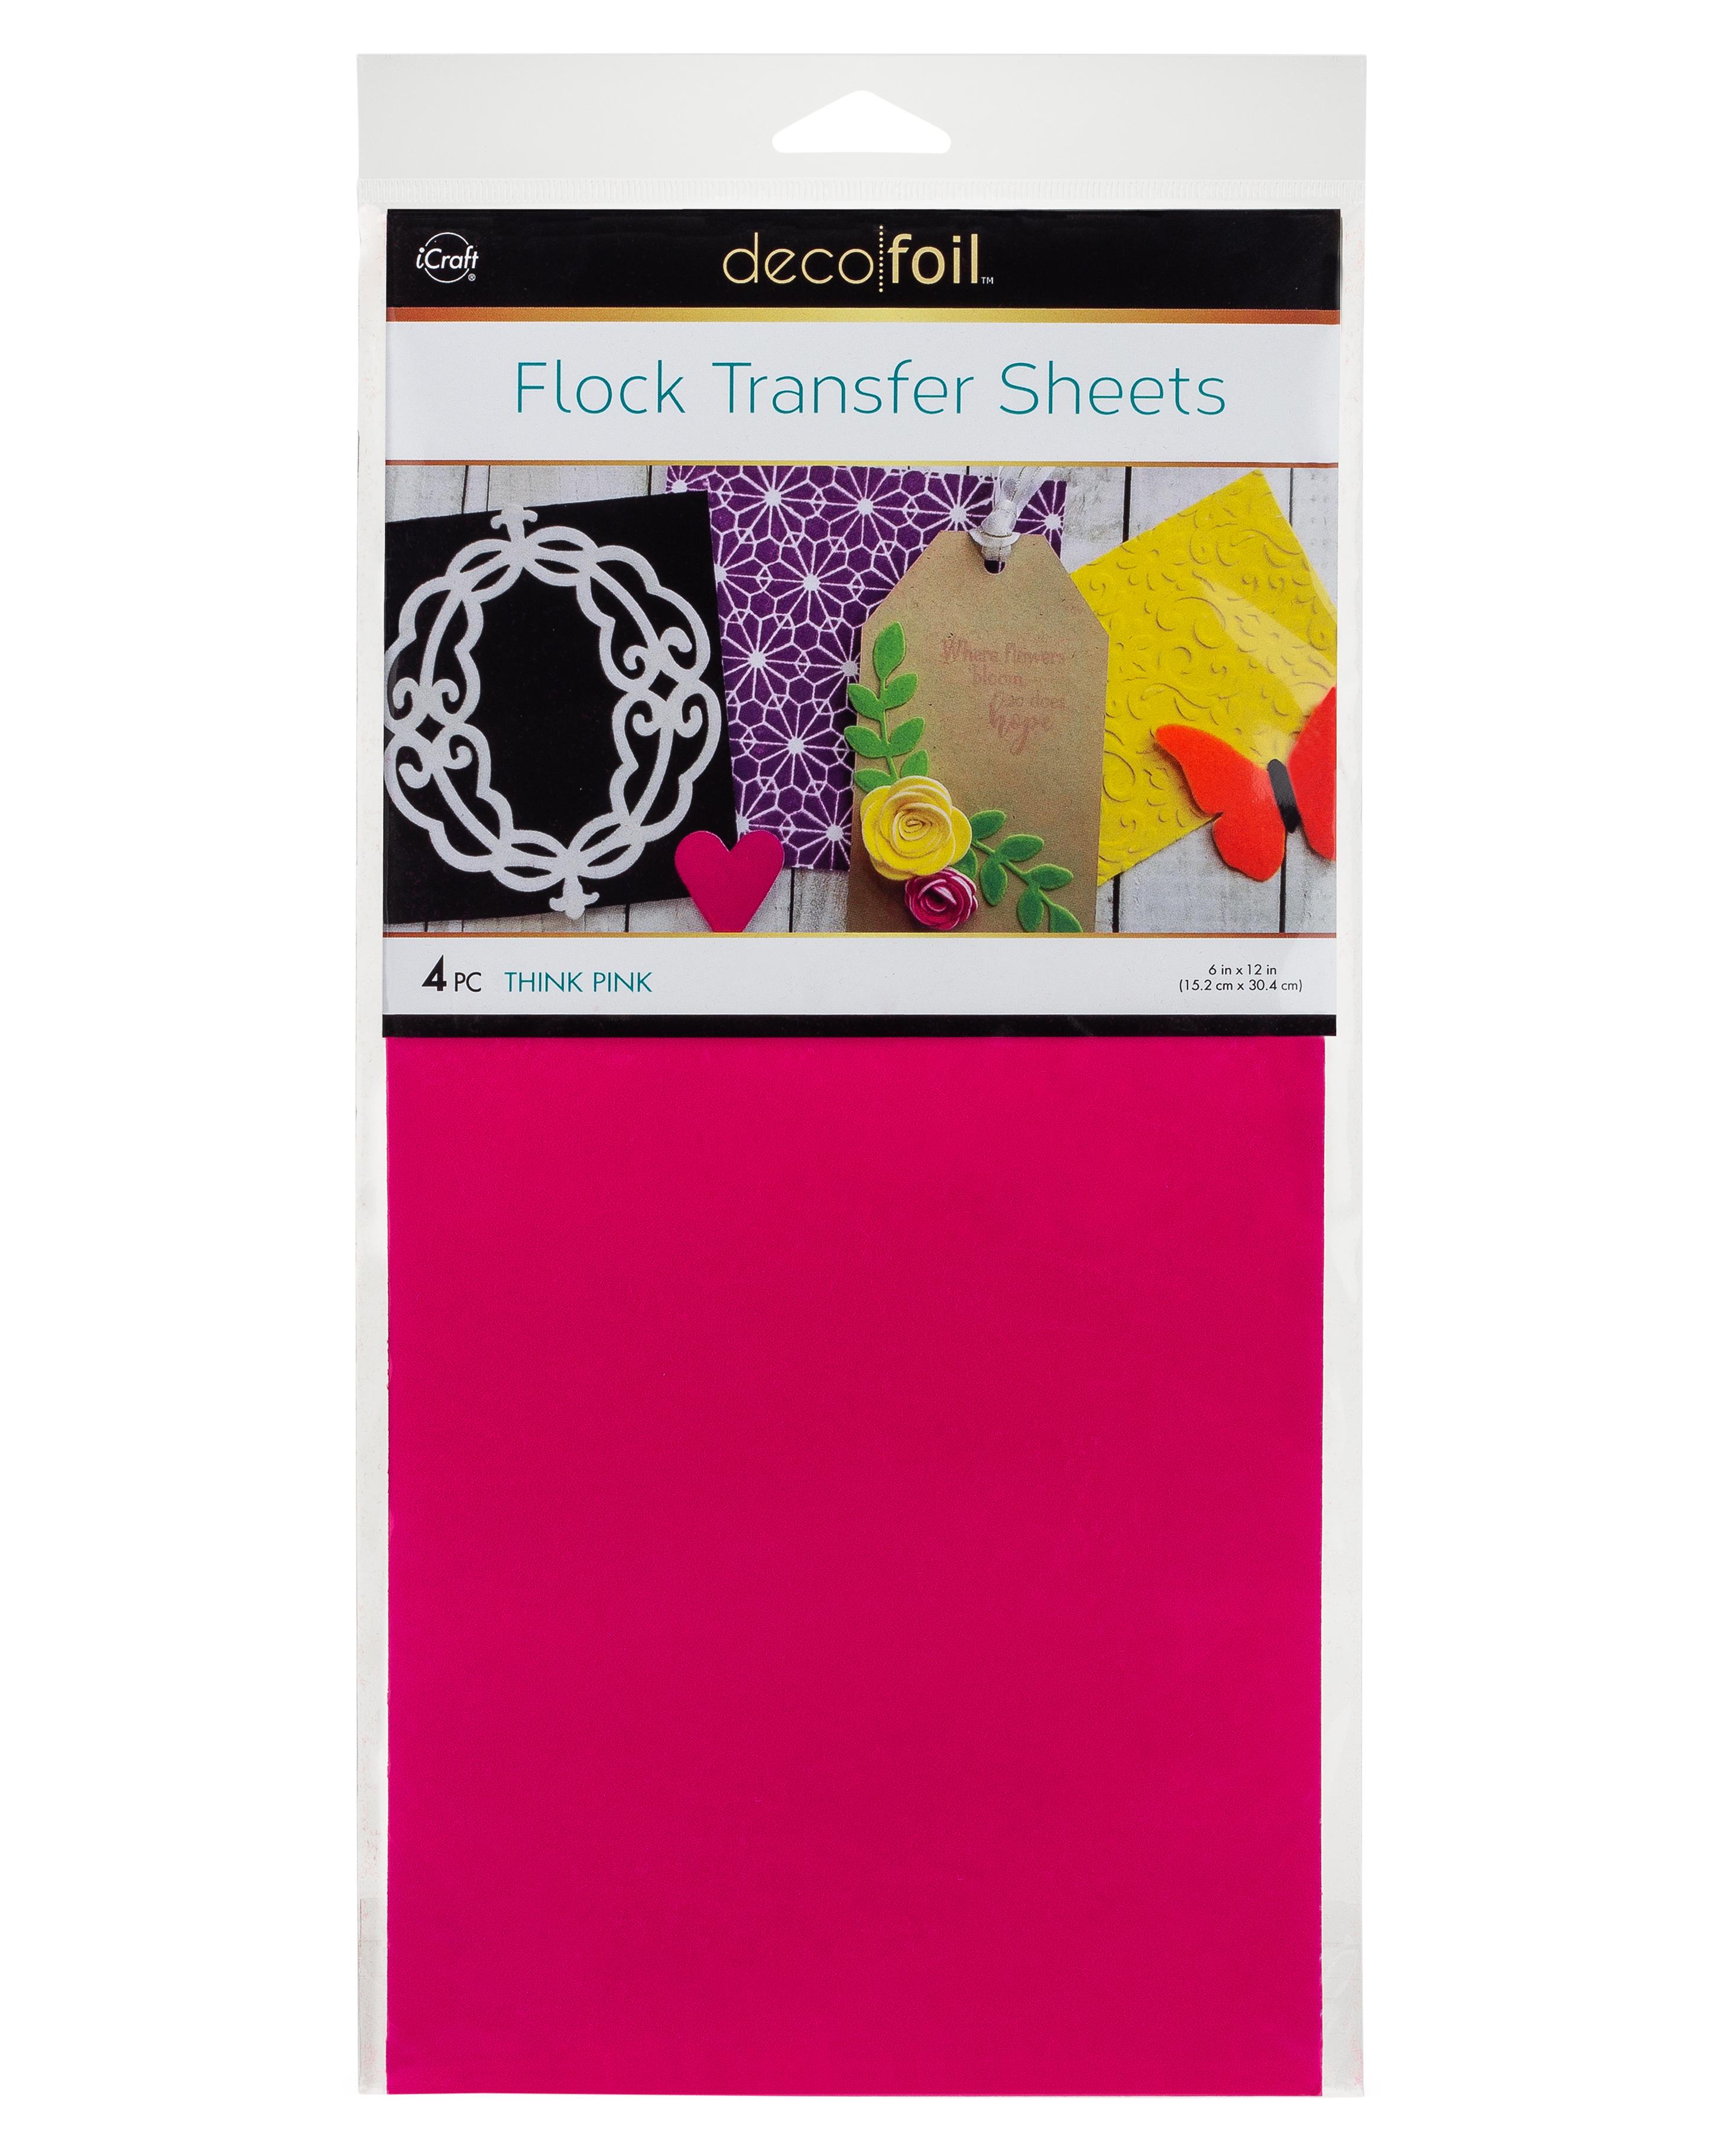 6X12 Deco Foil Flock Transfer Sheets, Think Pink